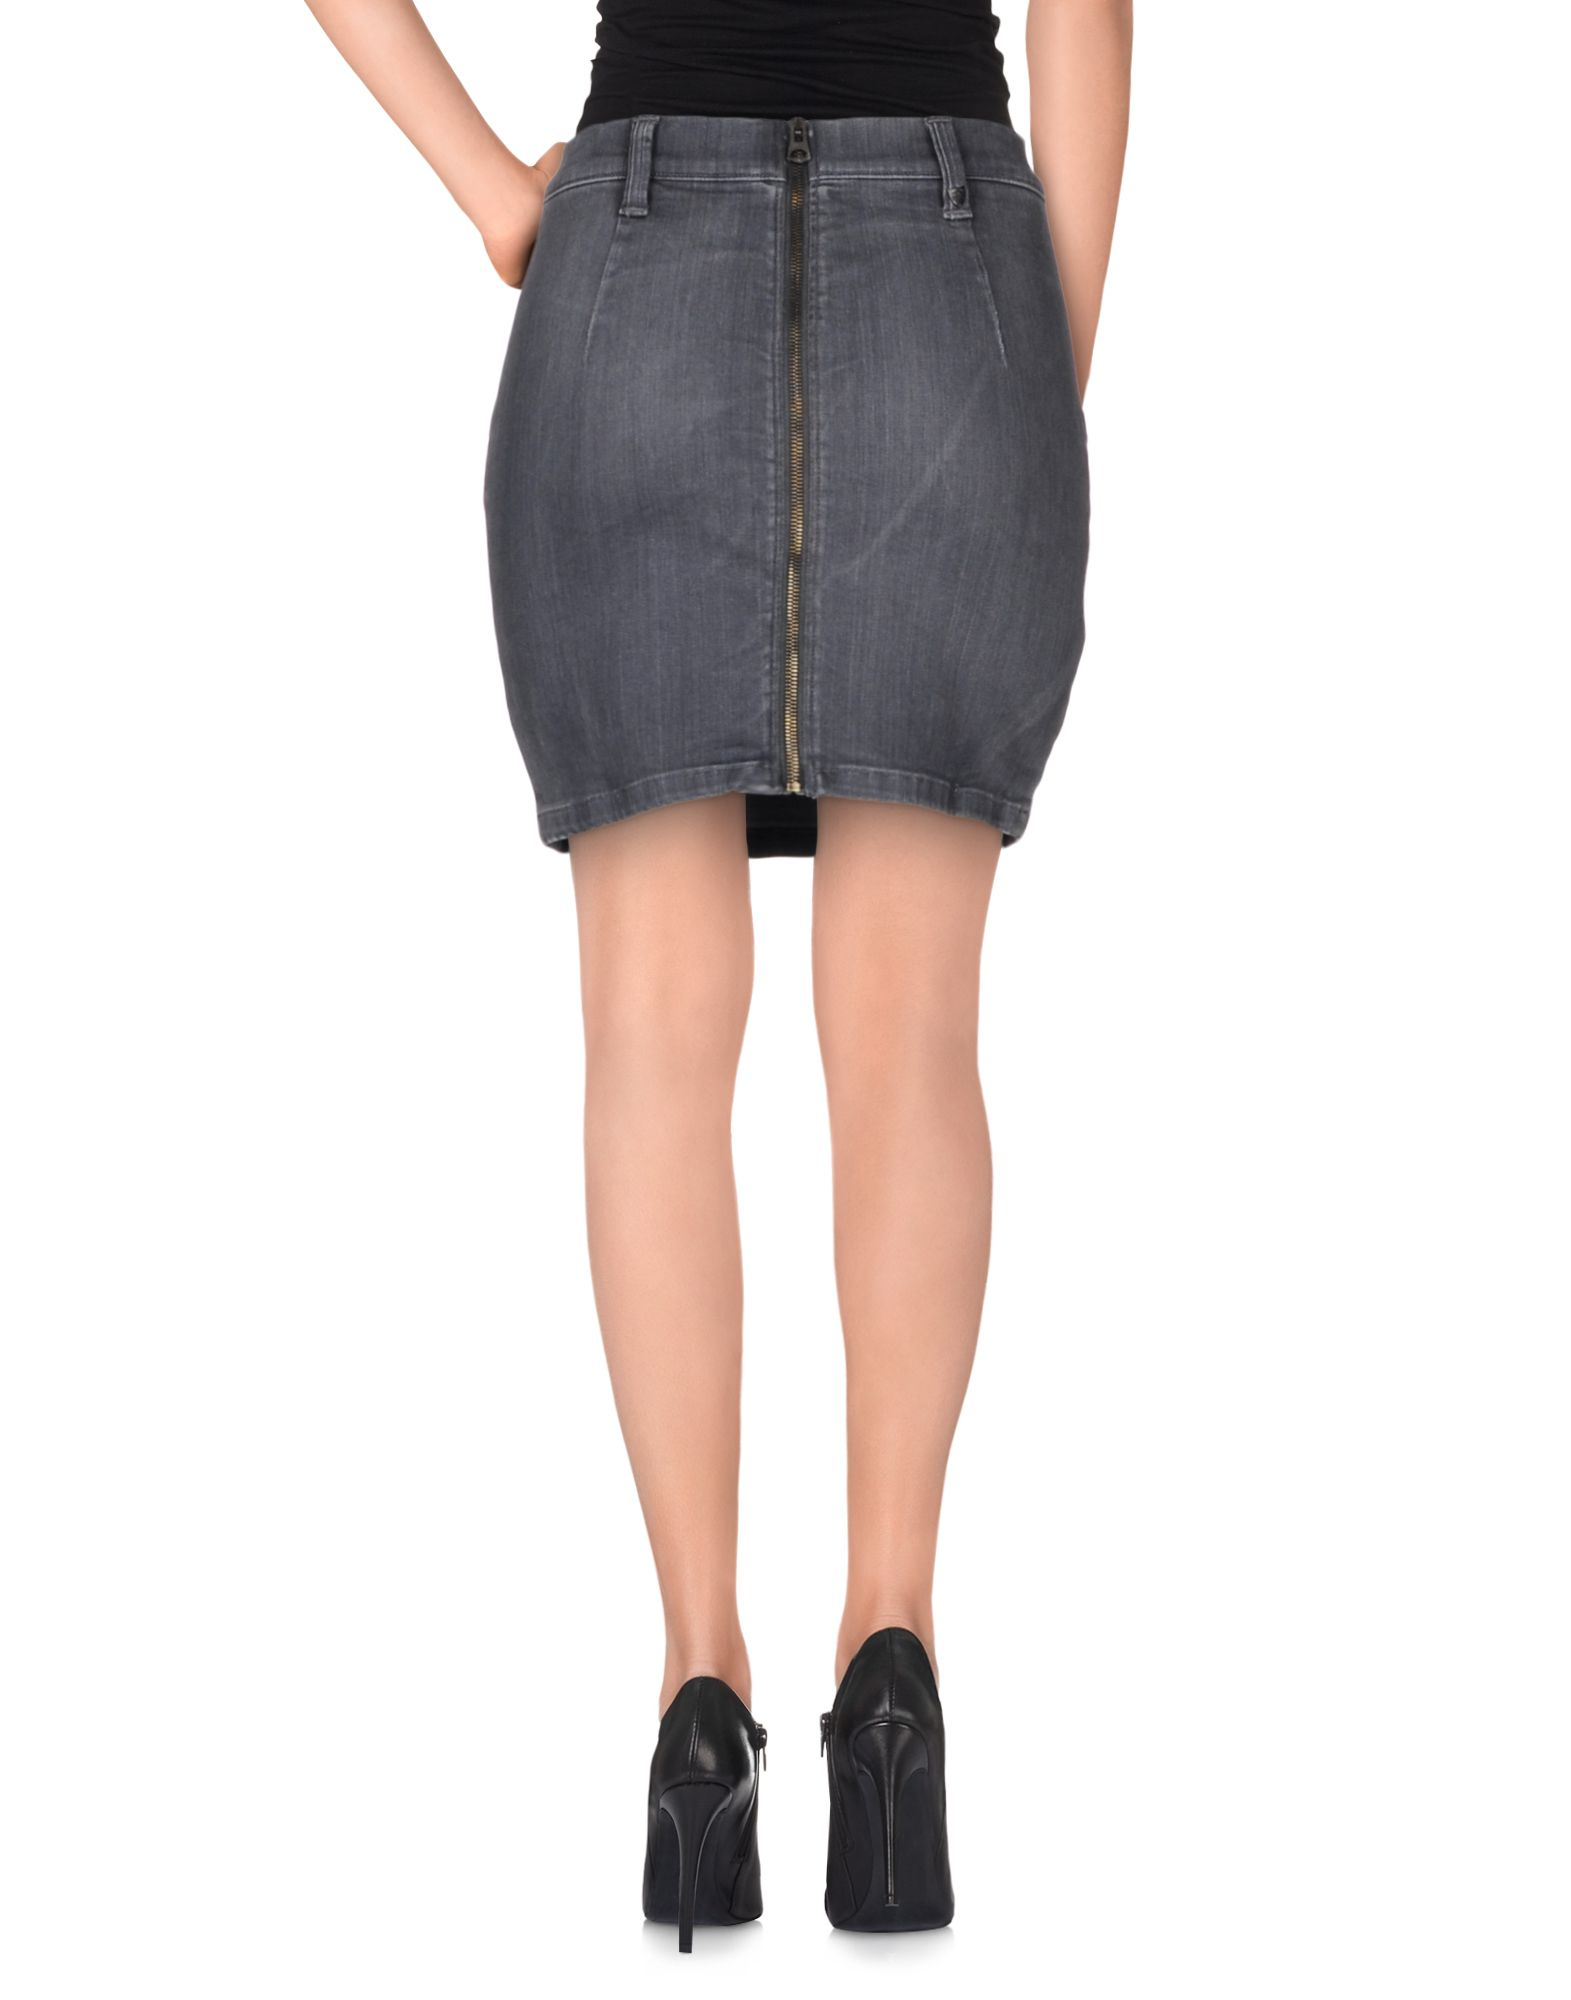 htc denim skirt in gray lyst